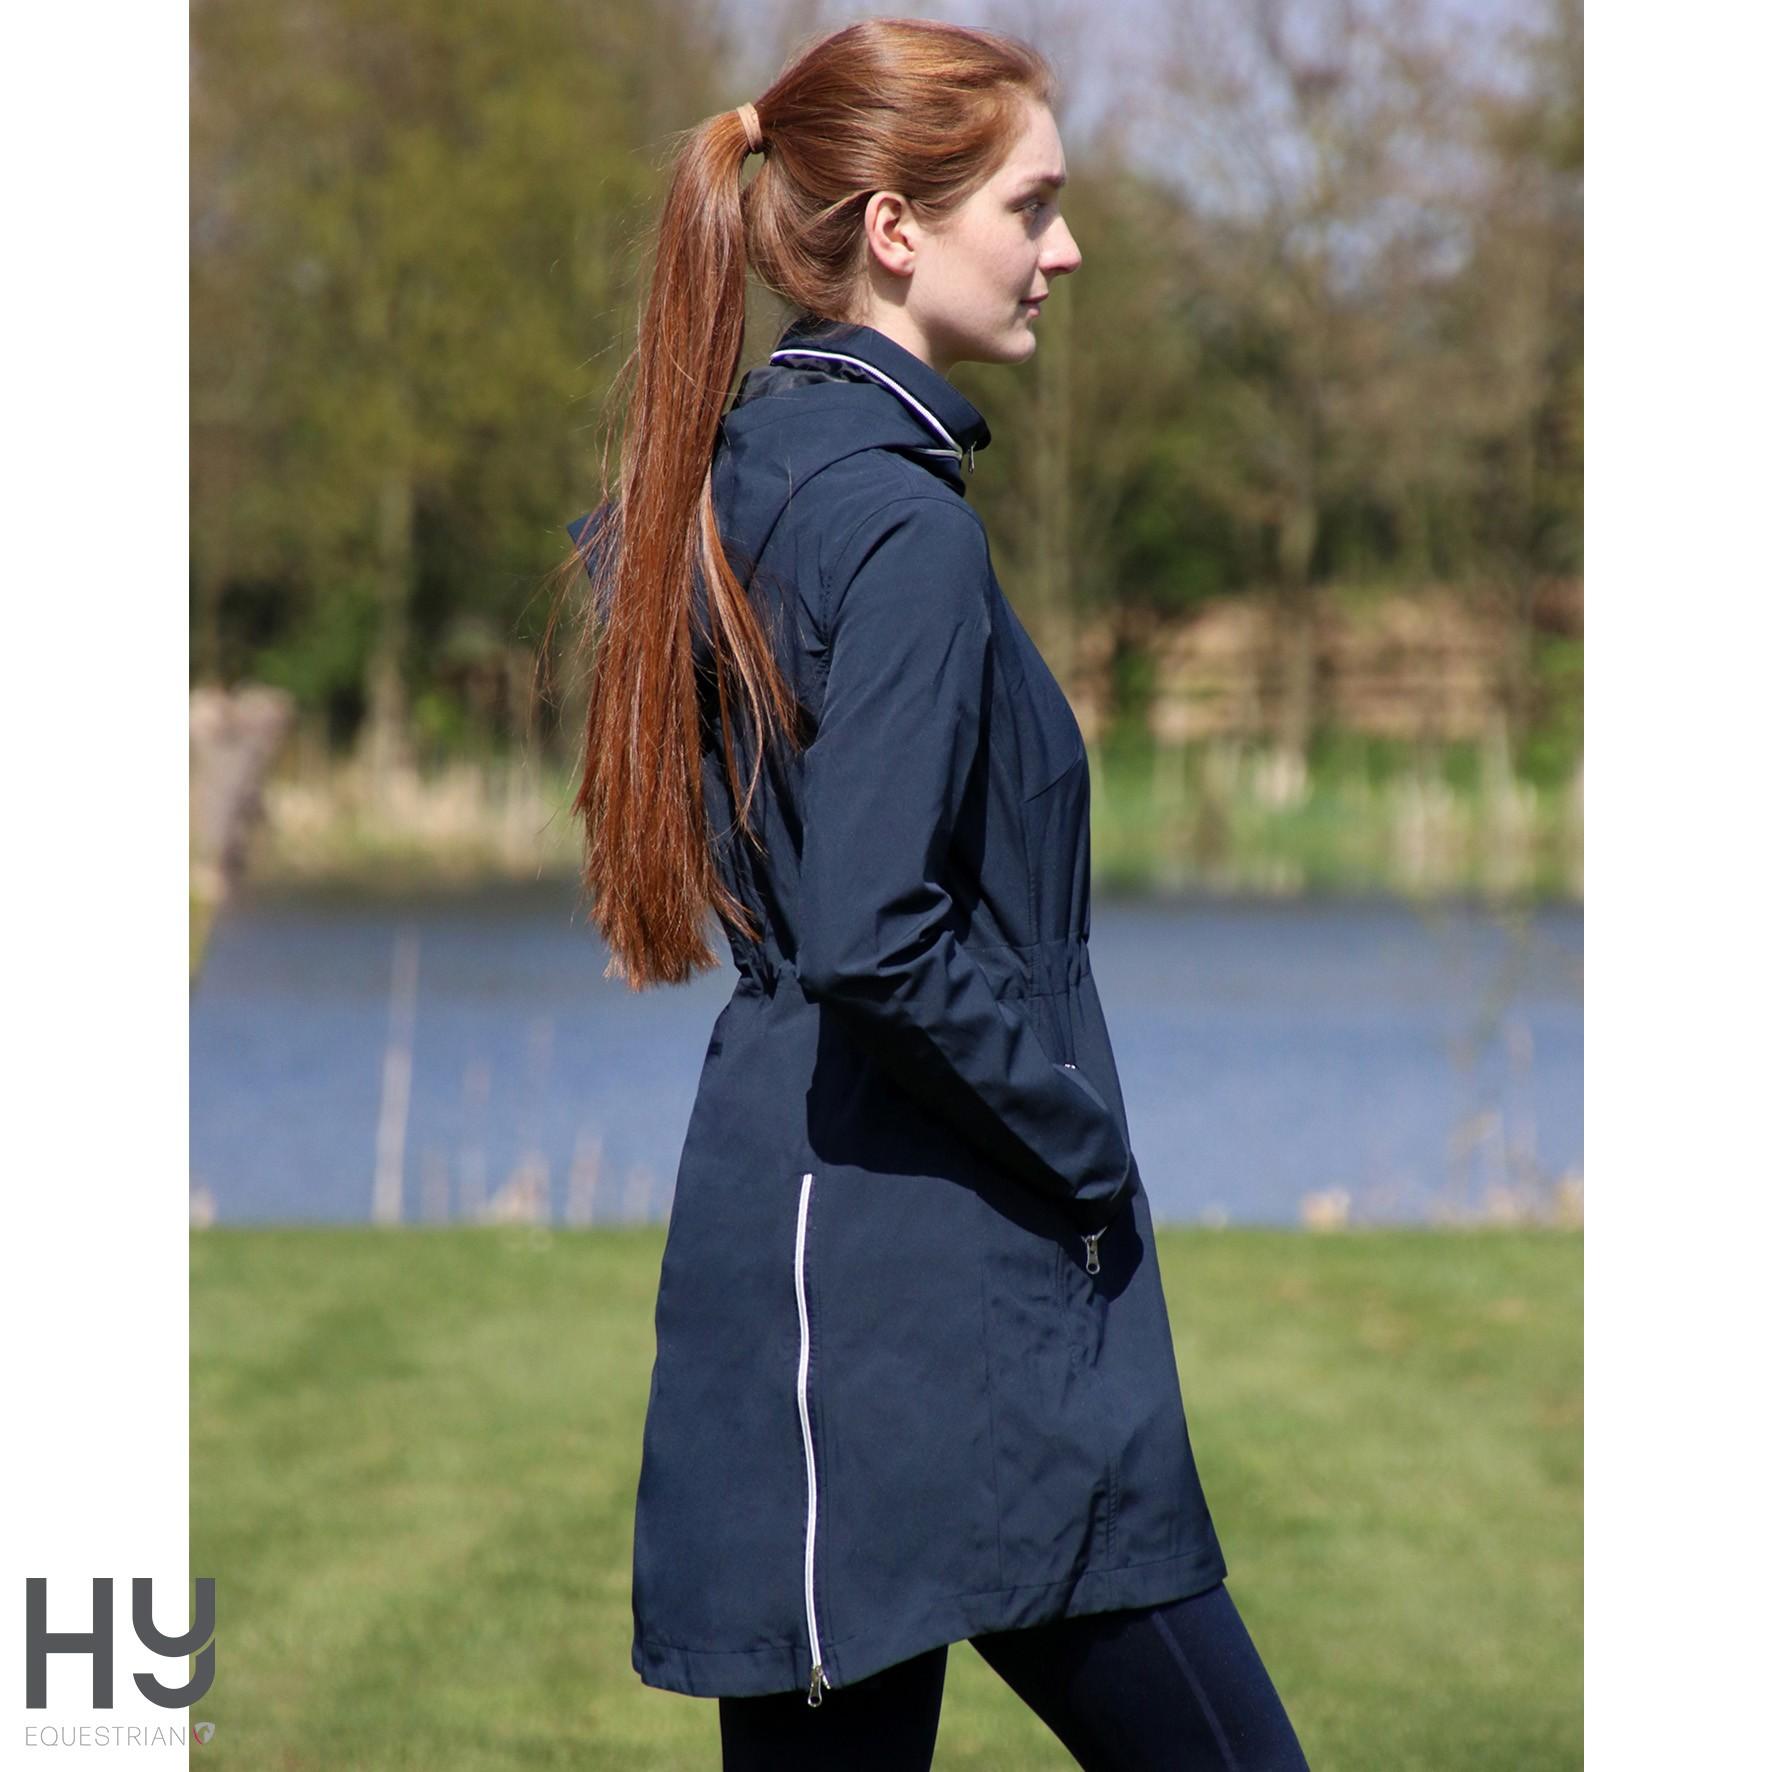 Synergy Long Rain Jacket by Hy Equestrian